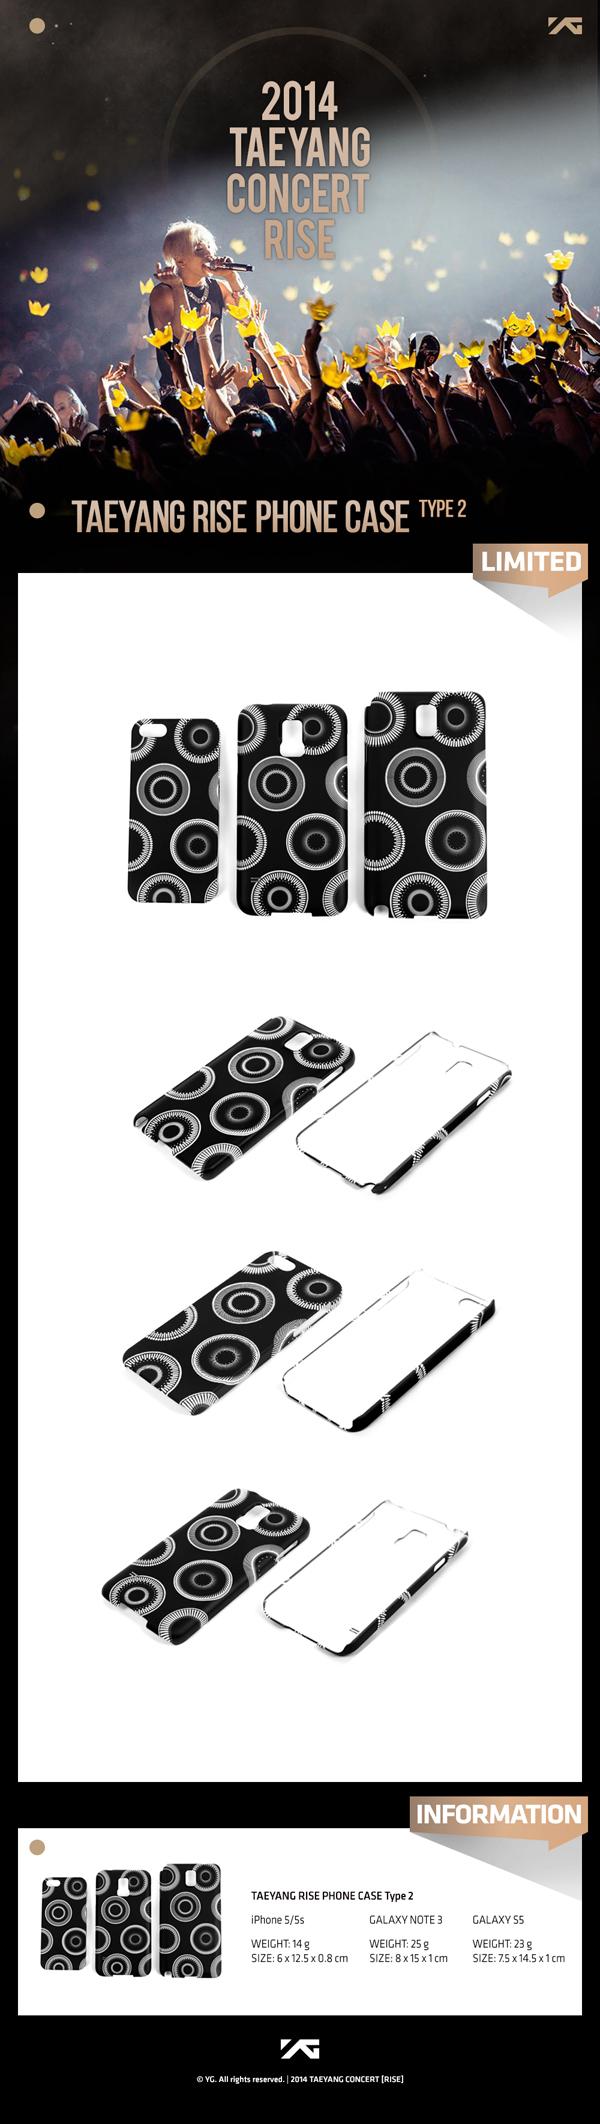 ty_phone_case_ty2_01